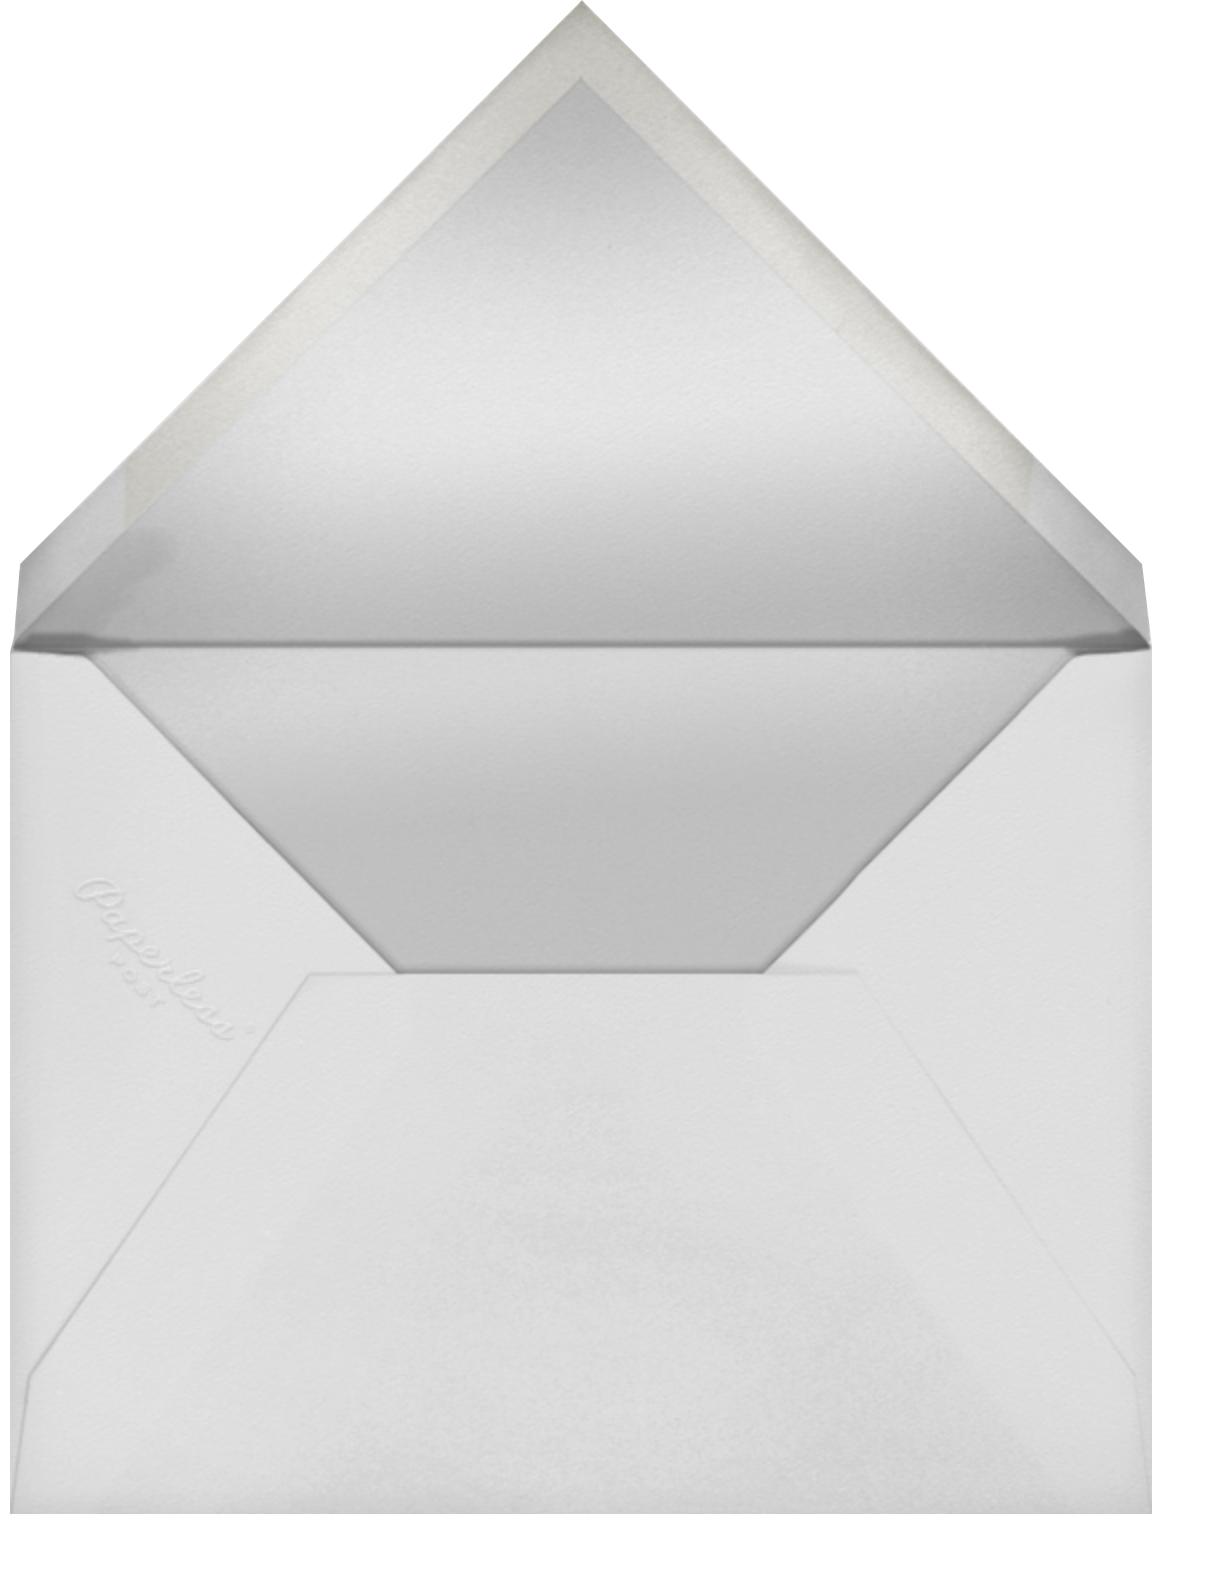 Gradient Full - Green - Paperless Post - Engagement party - envelope back